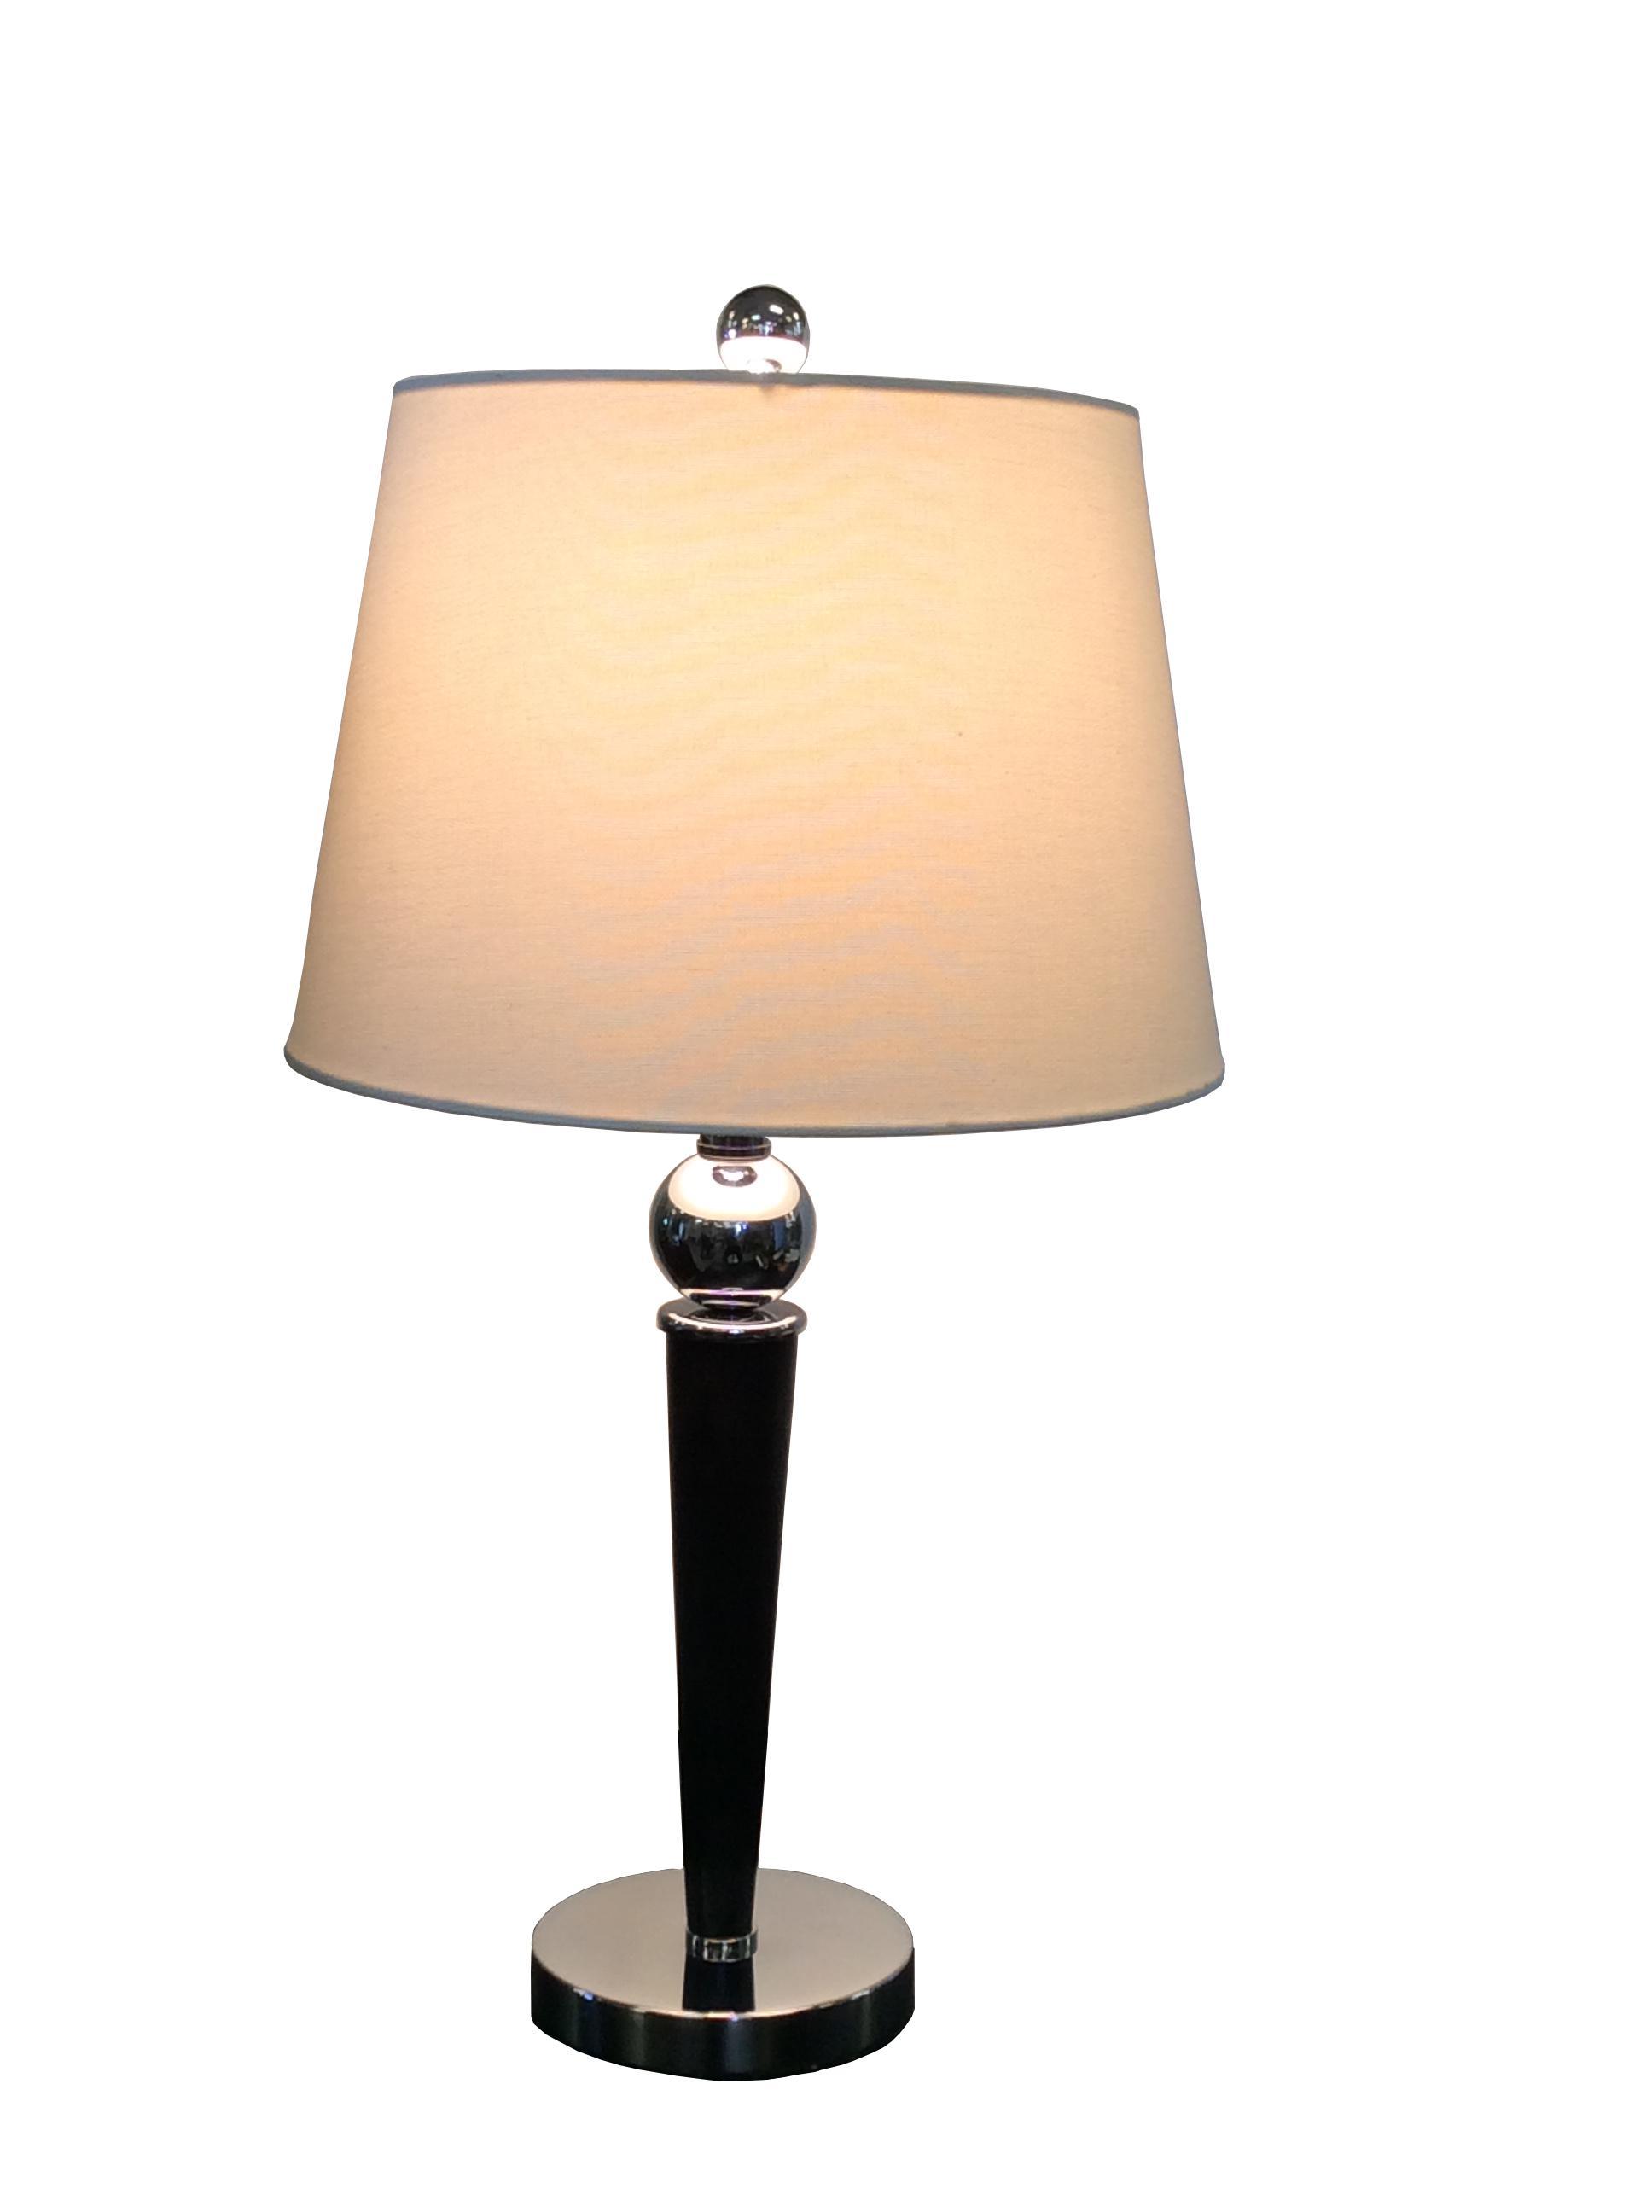 Modern Black & Chrome Table Lamp